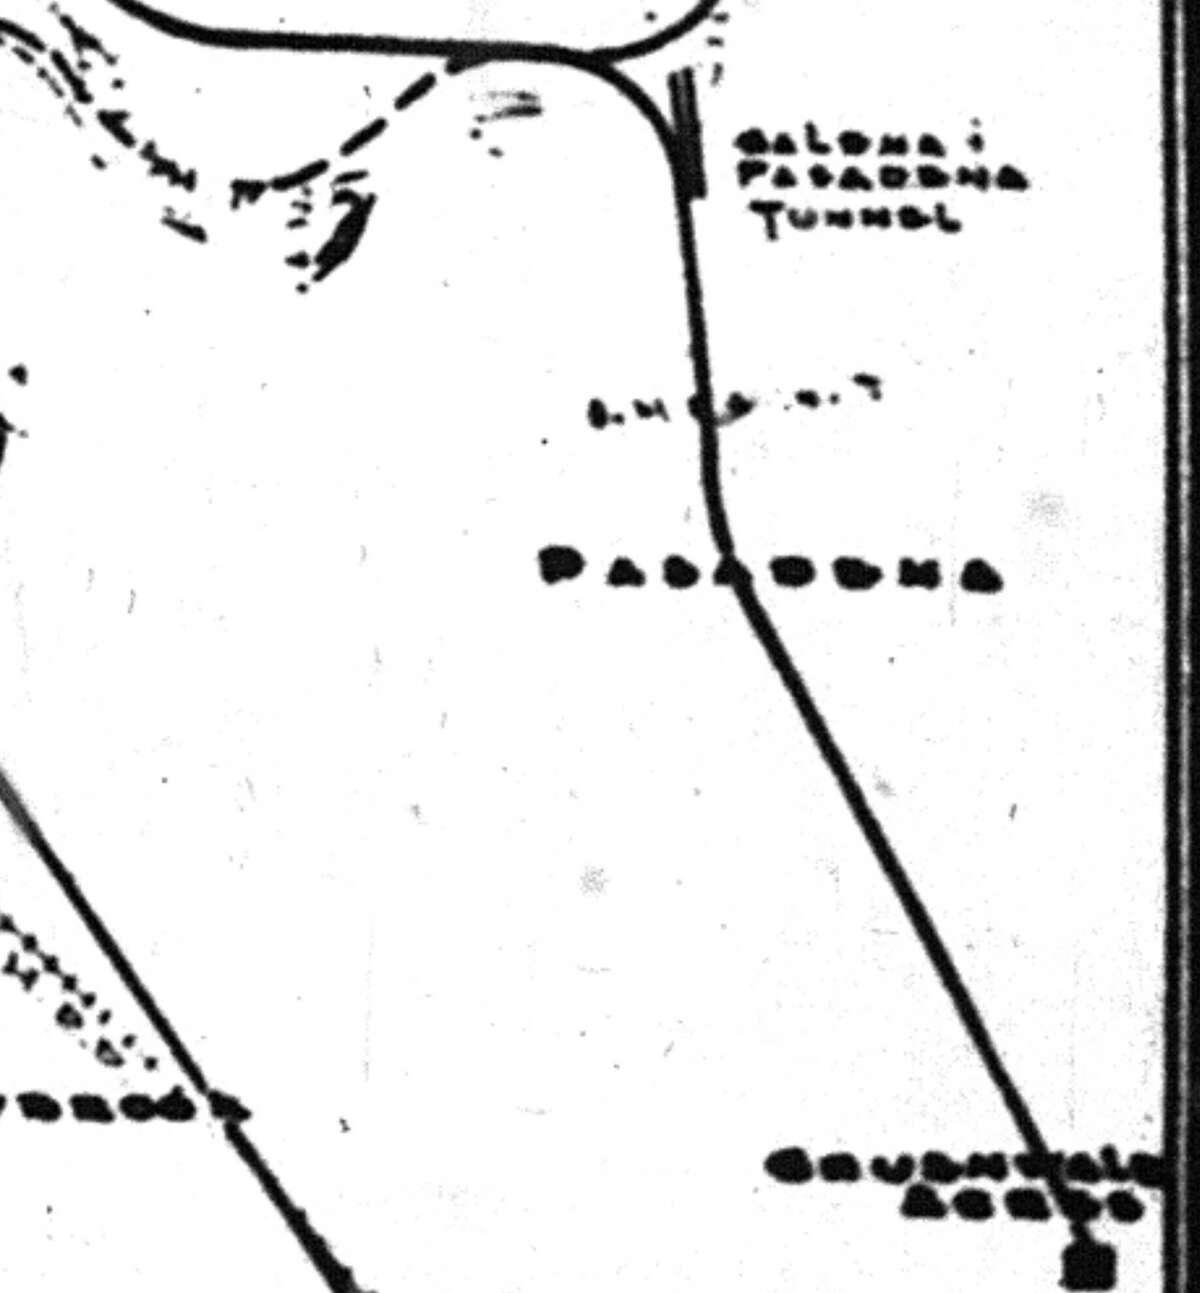 Pasadena line